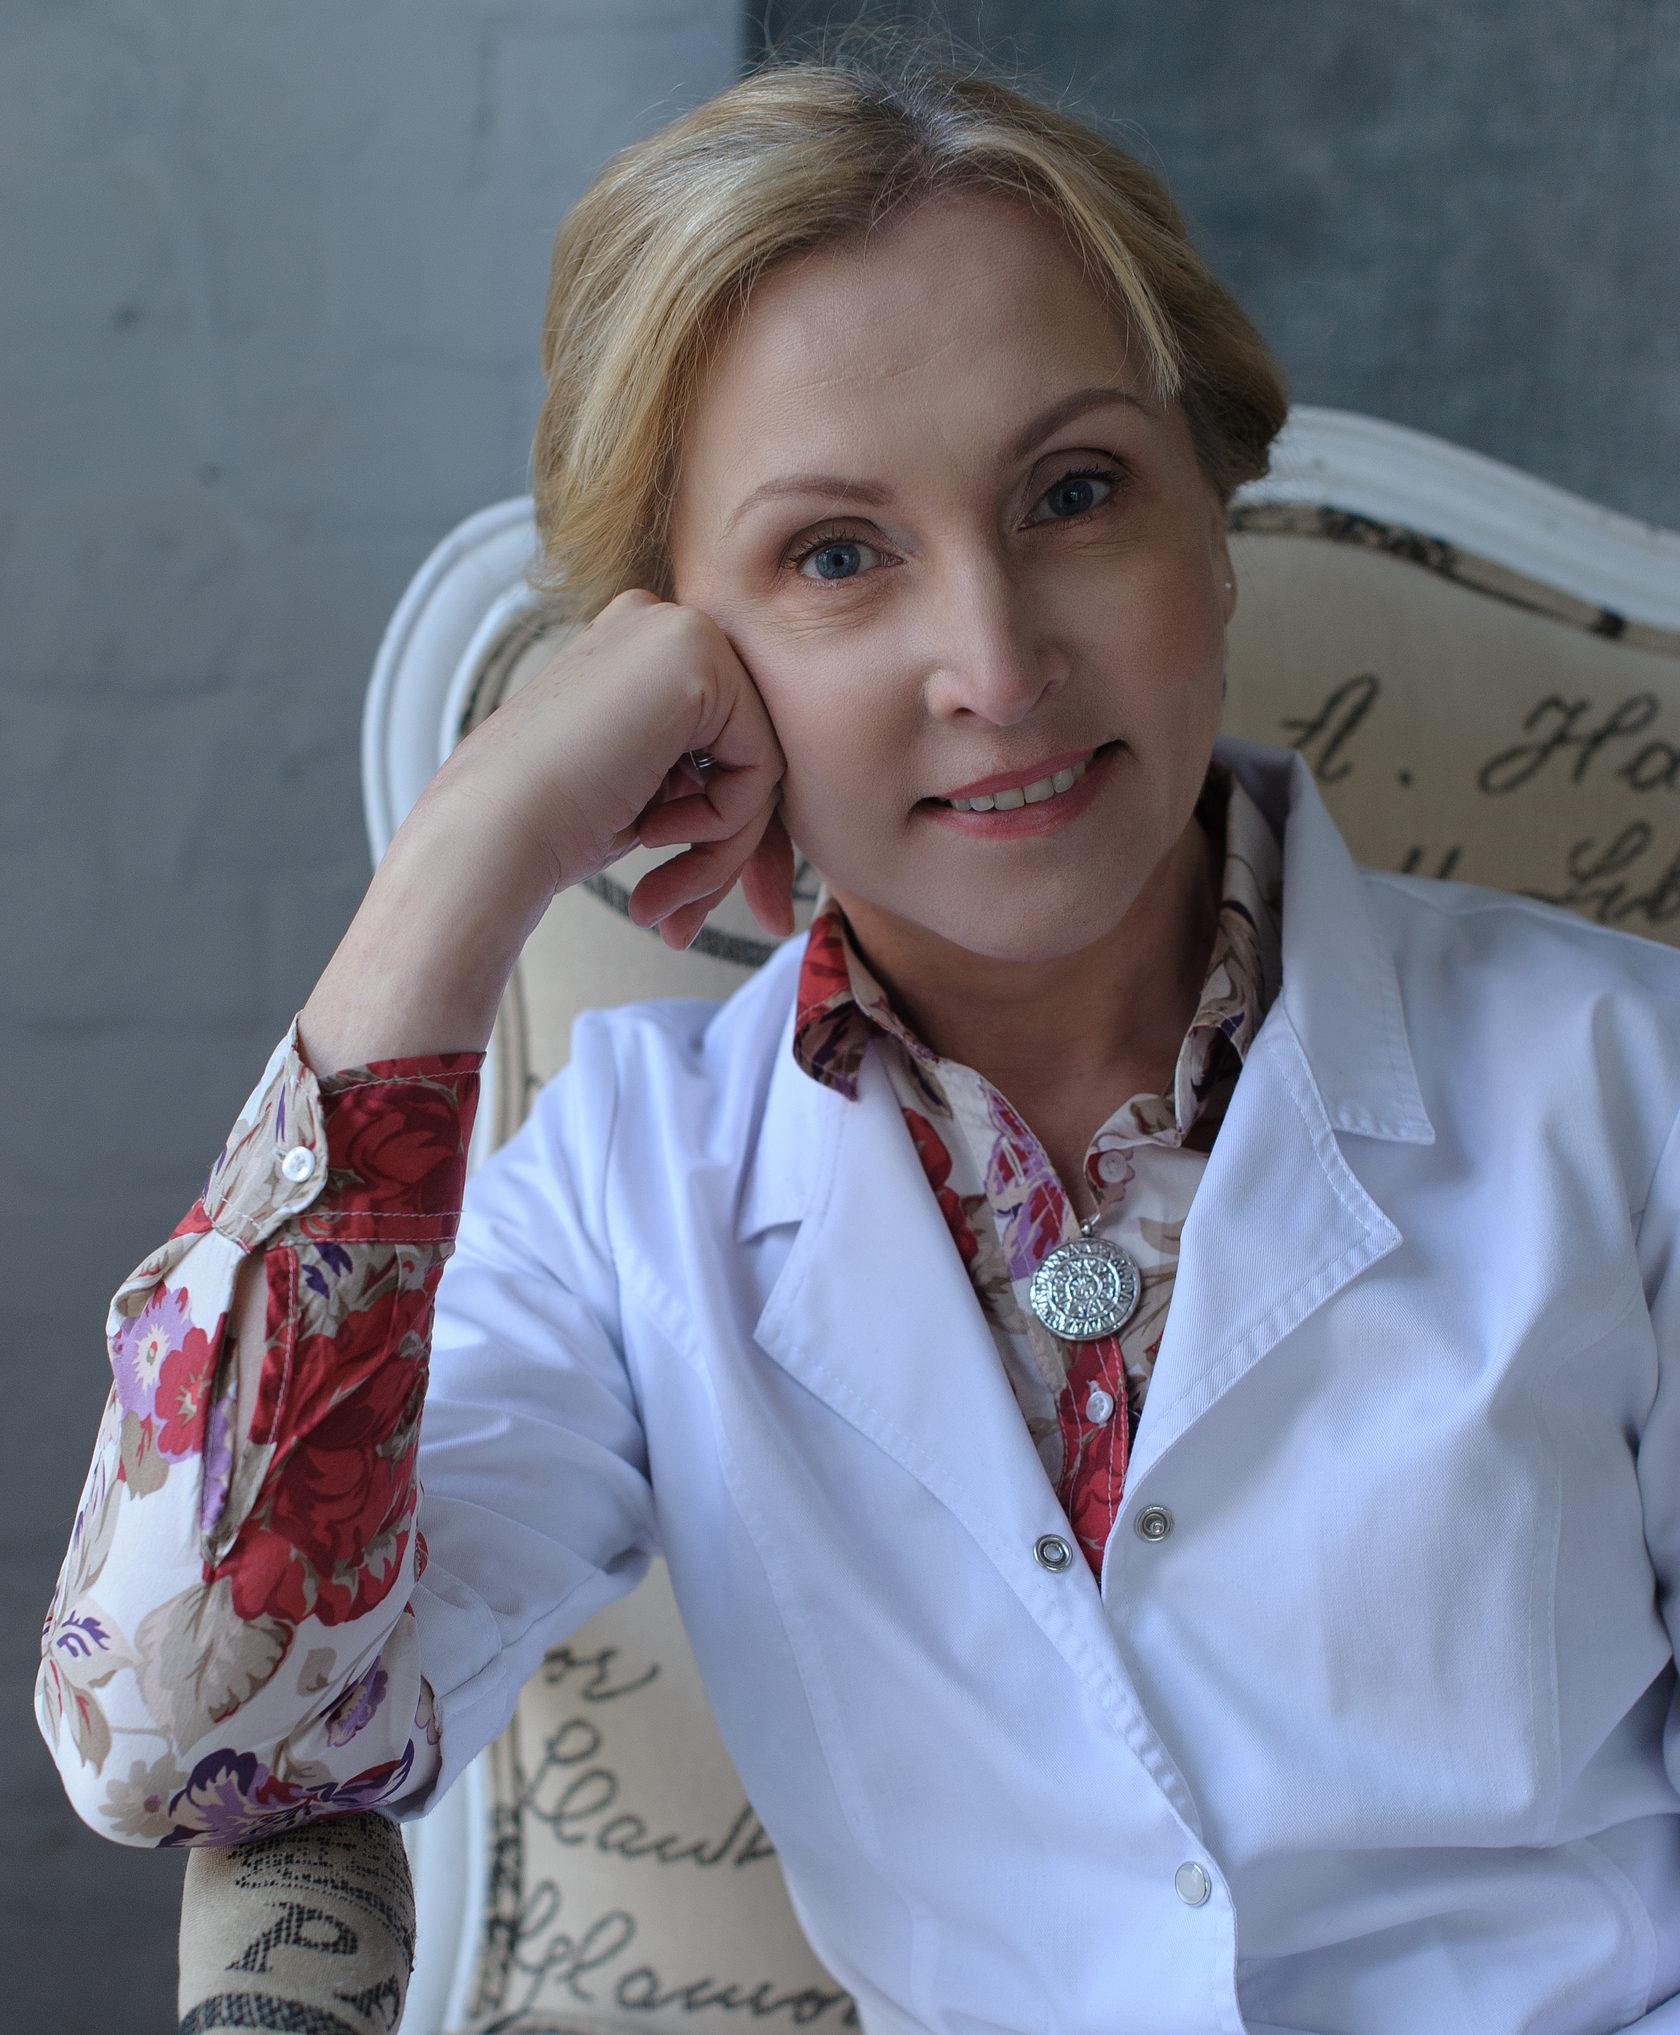 йогатерапевт, кандидат медицинских наук, врач акушер-гинеколог